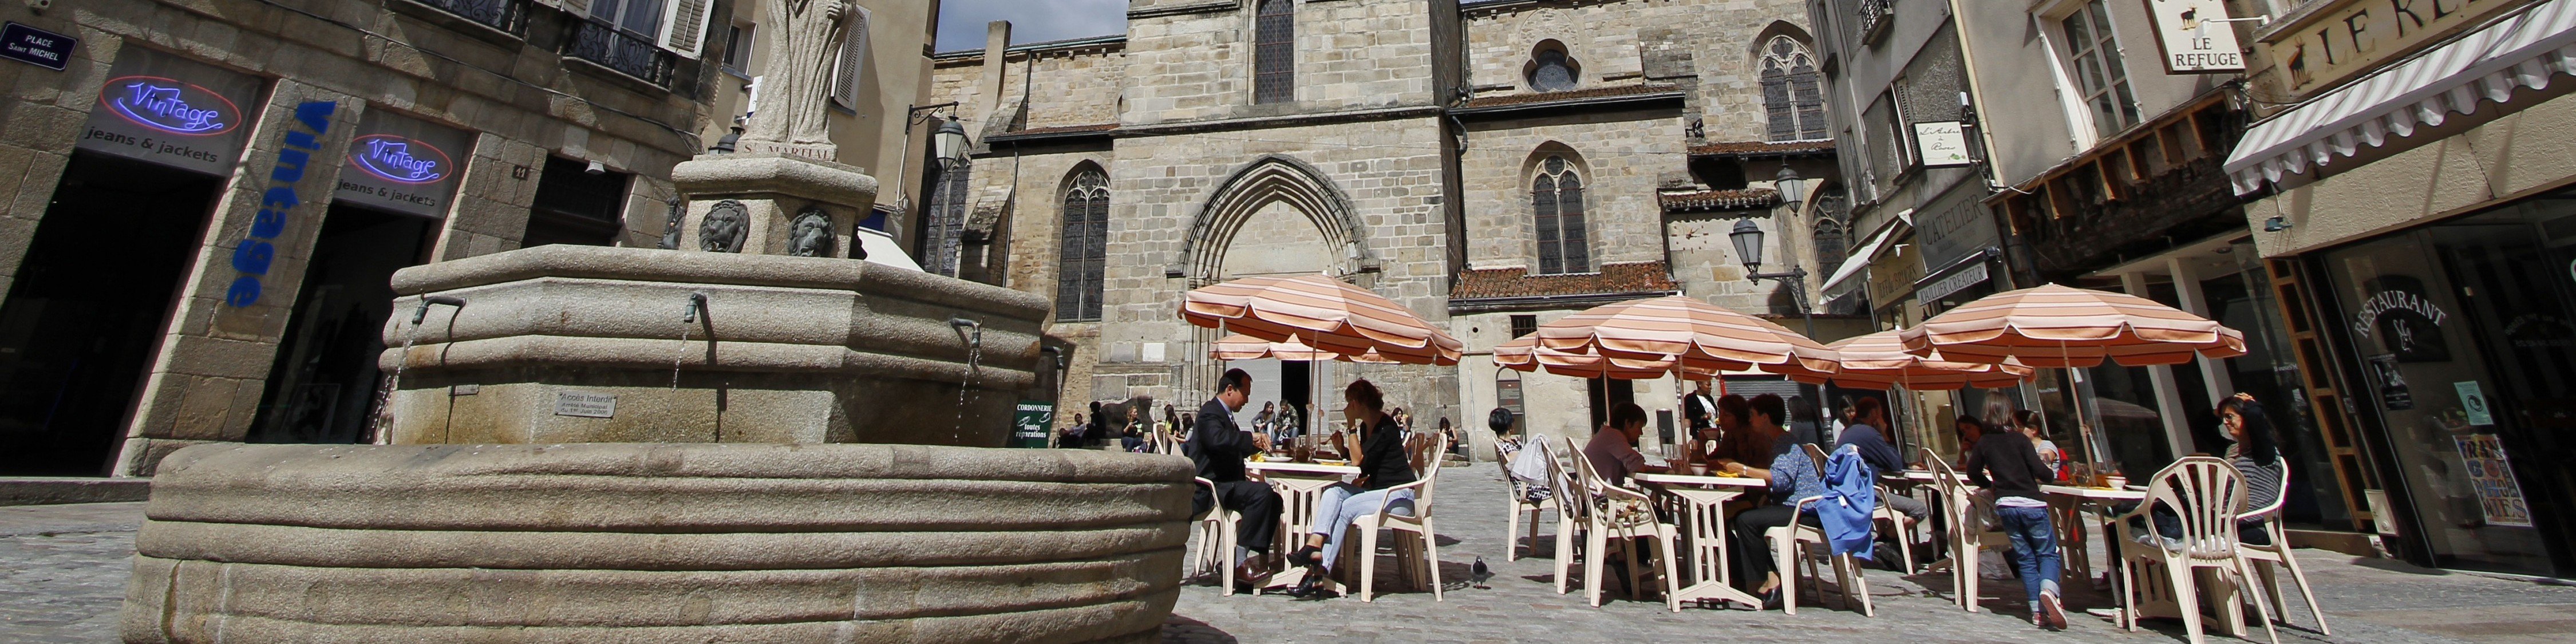 Alternance Limousin – Limoges